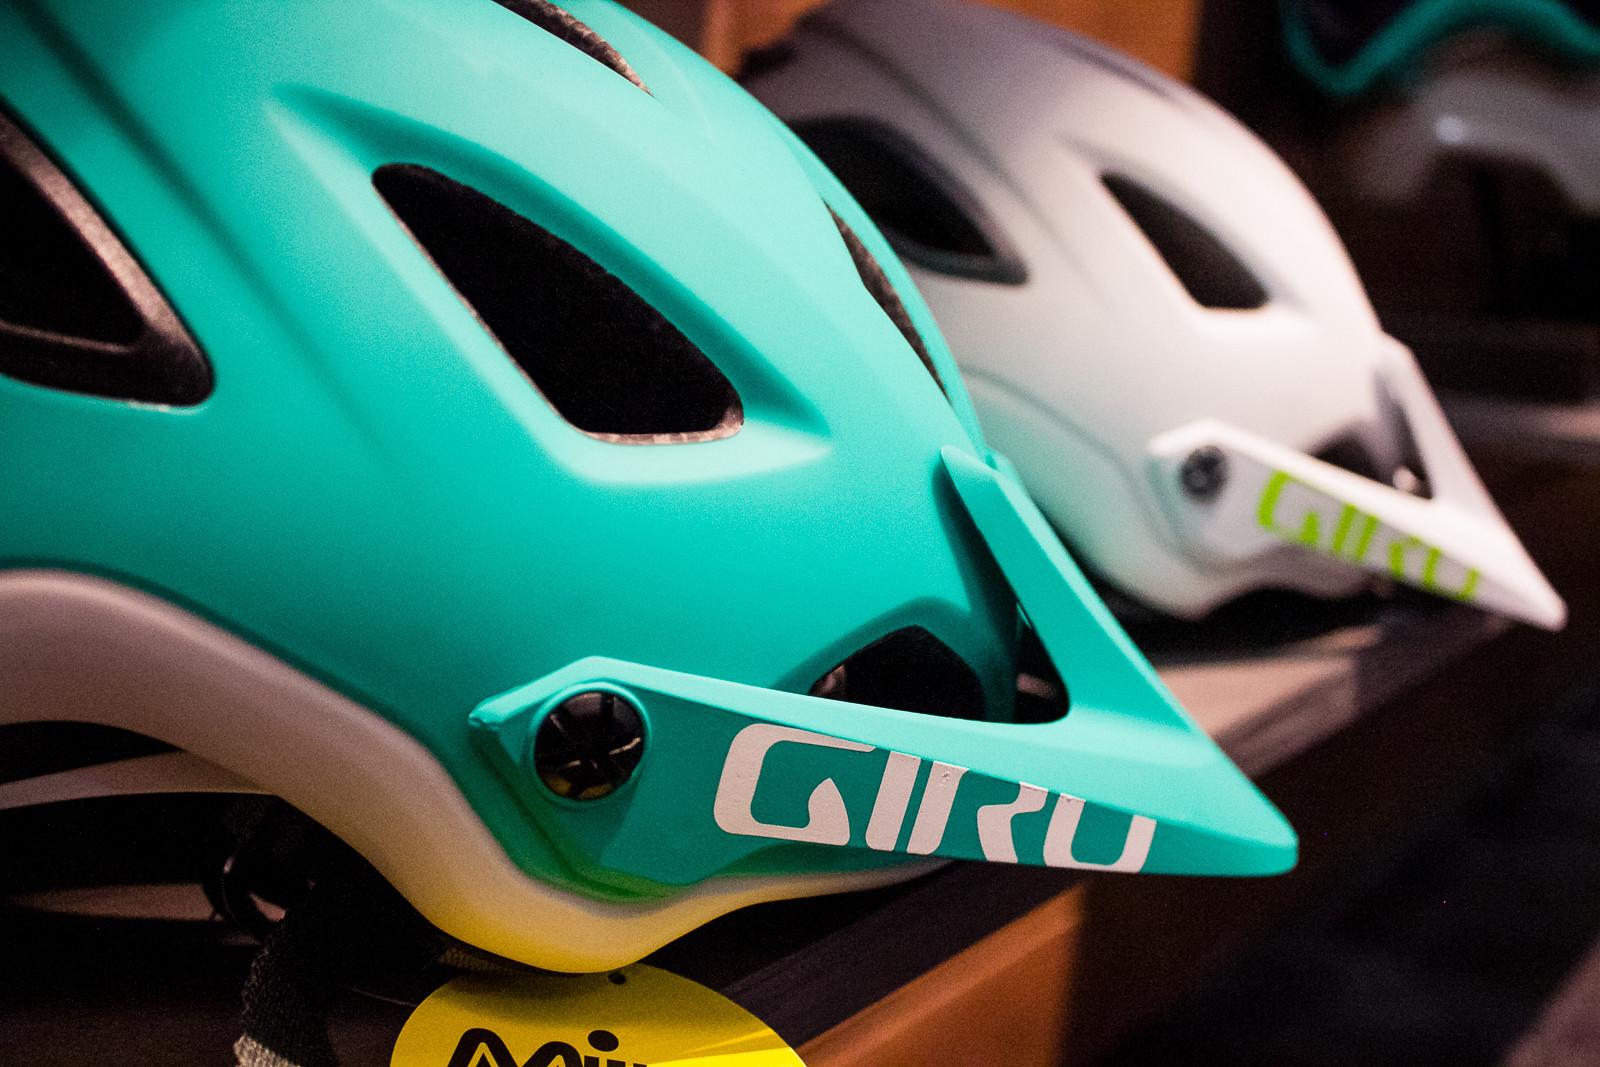 2016 Giro Women's Mantara Helmets - 2016 Women's Bikes and Gear at Interbike - Mountain Biking Pictures - Vital MTB